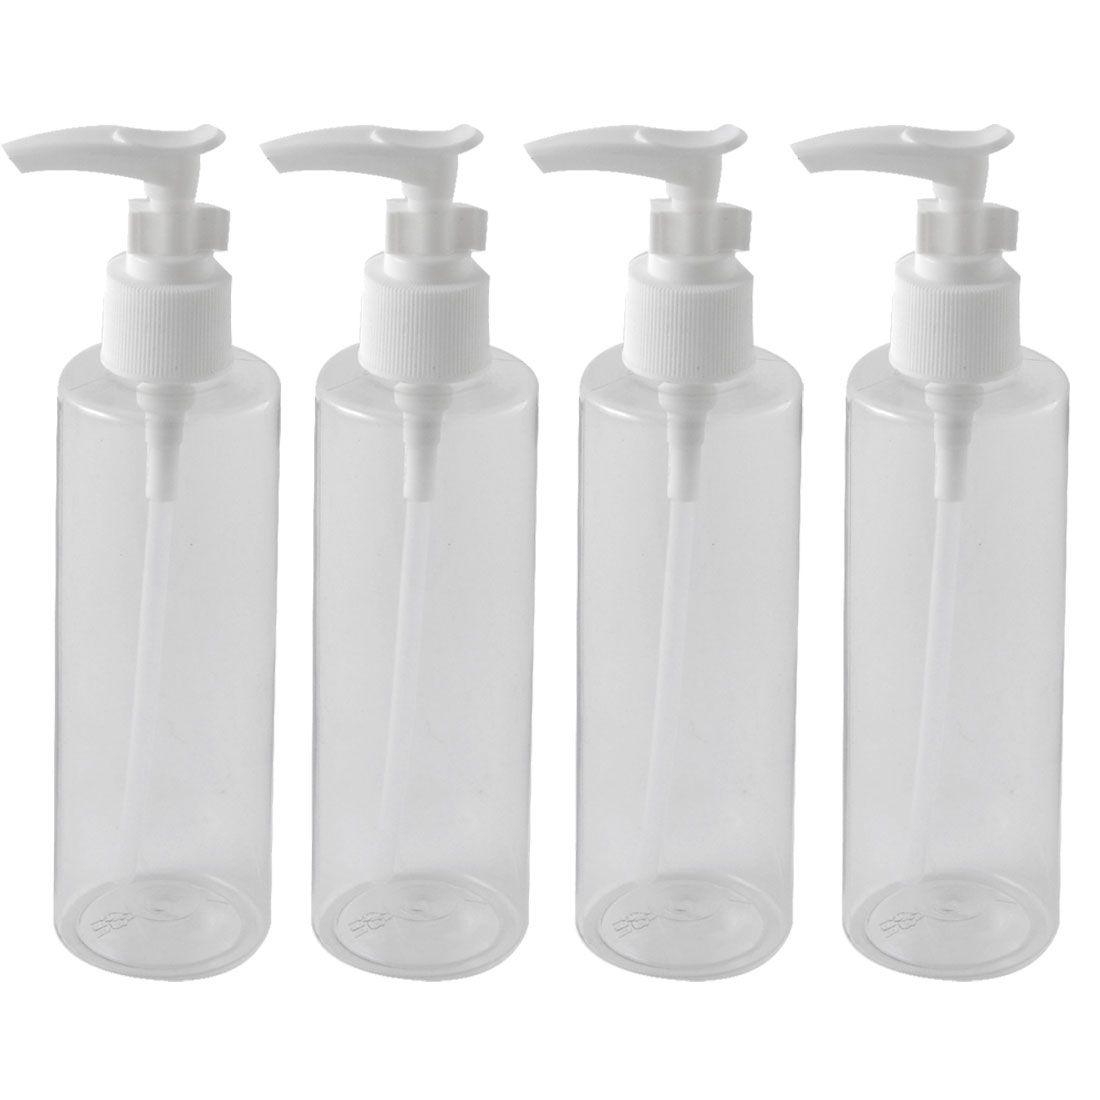 Traveling Lady Plastic Shampoo Cosmetic Emulsion Spray Hand Press Bottle Clear 250ml 4pcs